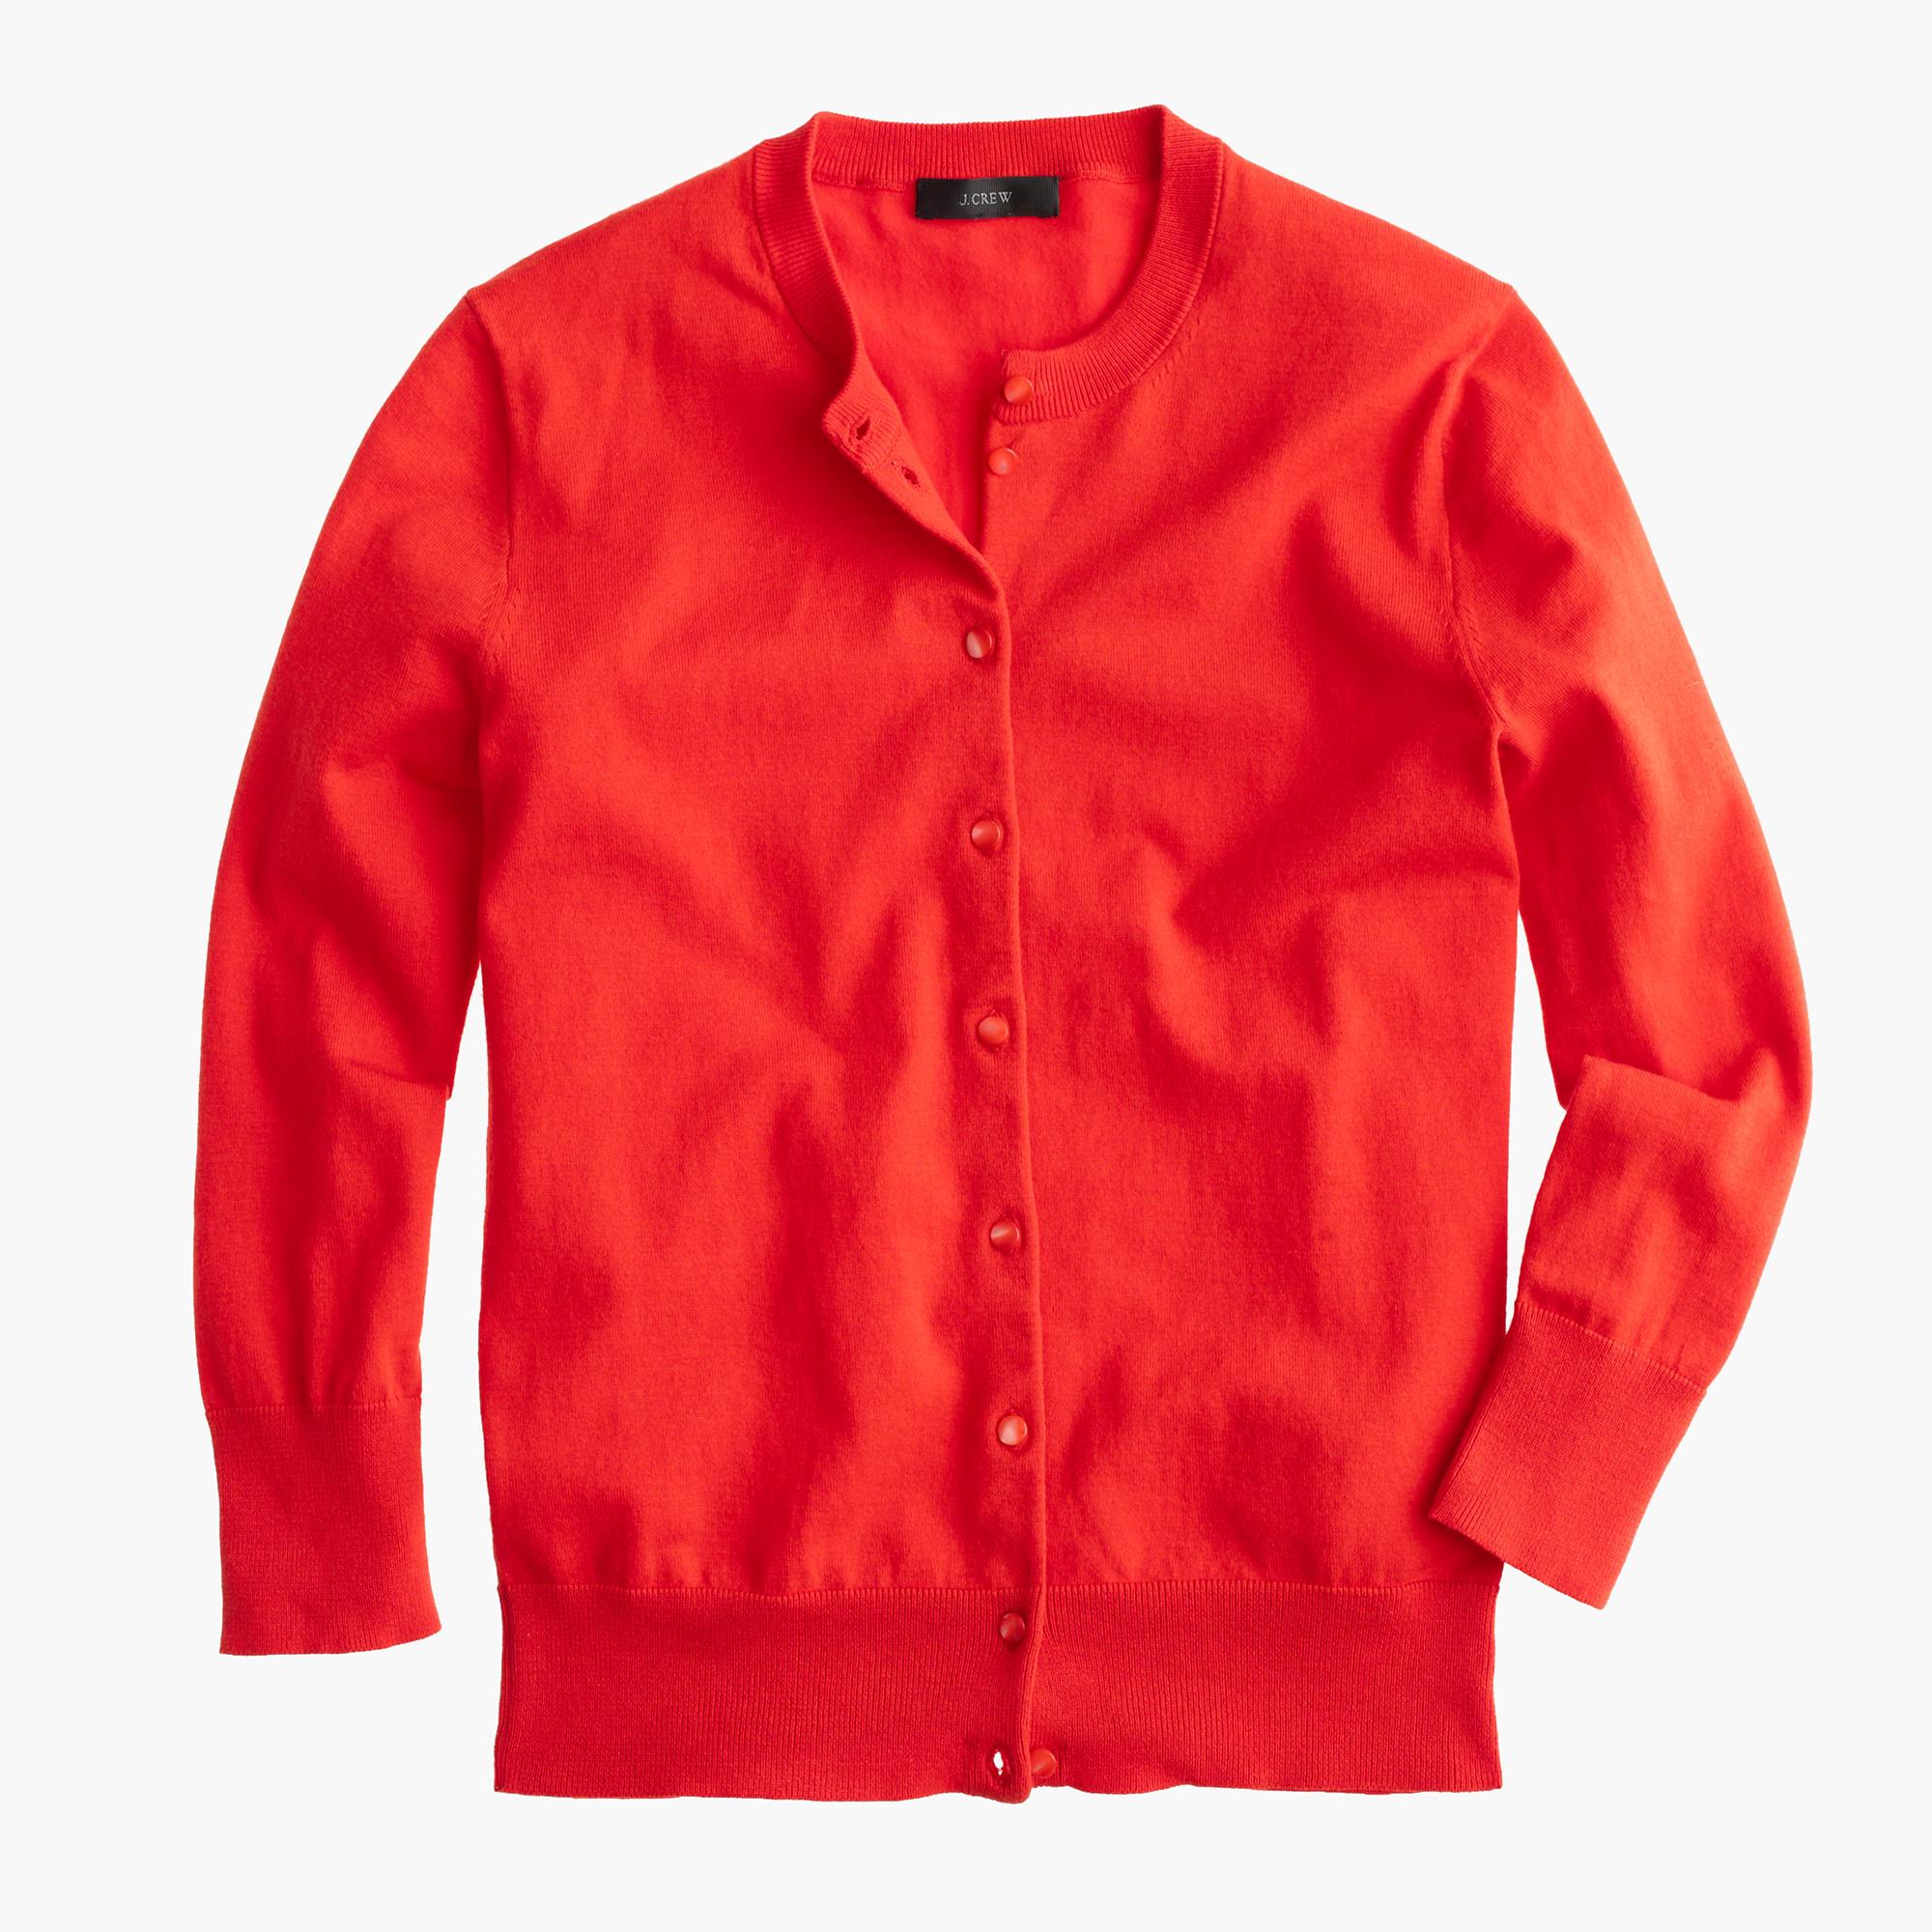 Cotton Jackie cardigan sweater : Women Cardigans & Shells | Factory